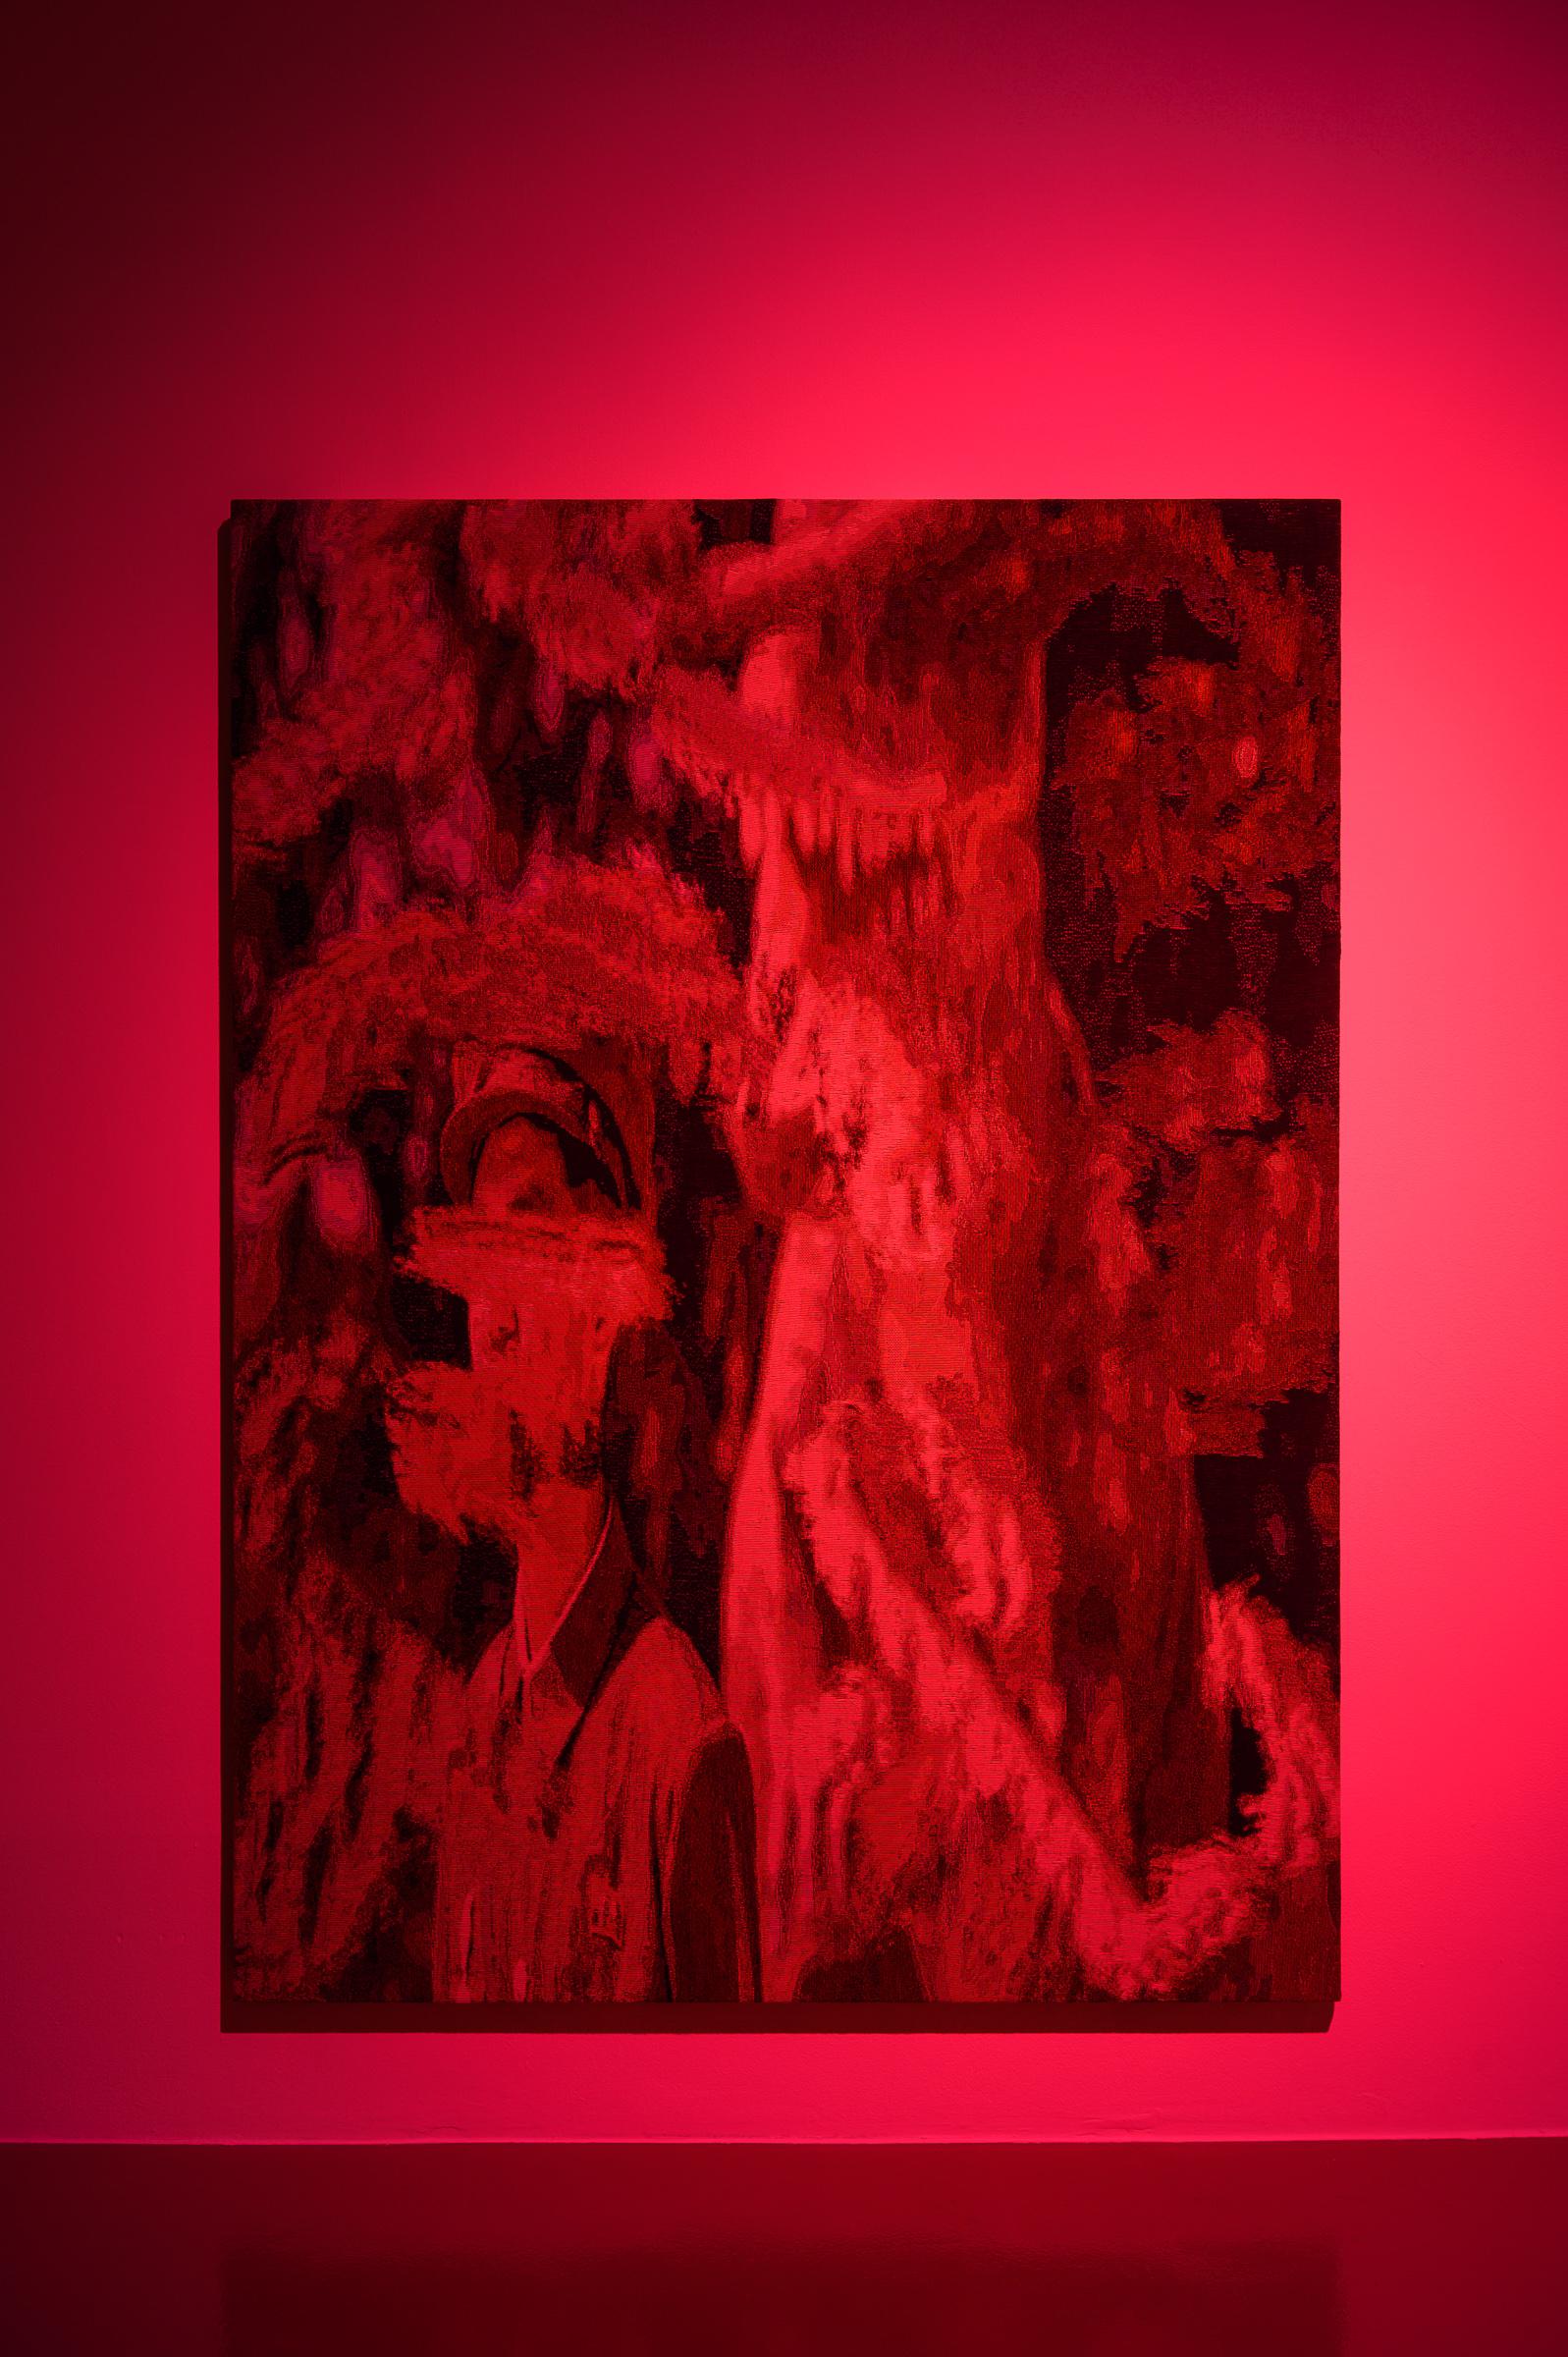 h6^8DJ, 2019 190cm x 140cm Dye Cotton Tapestry